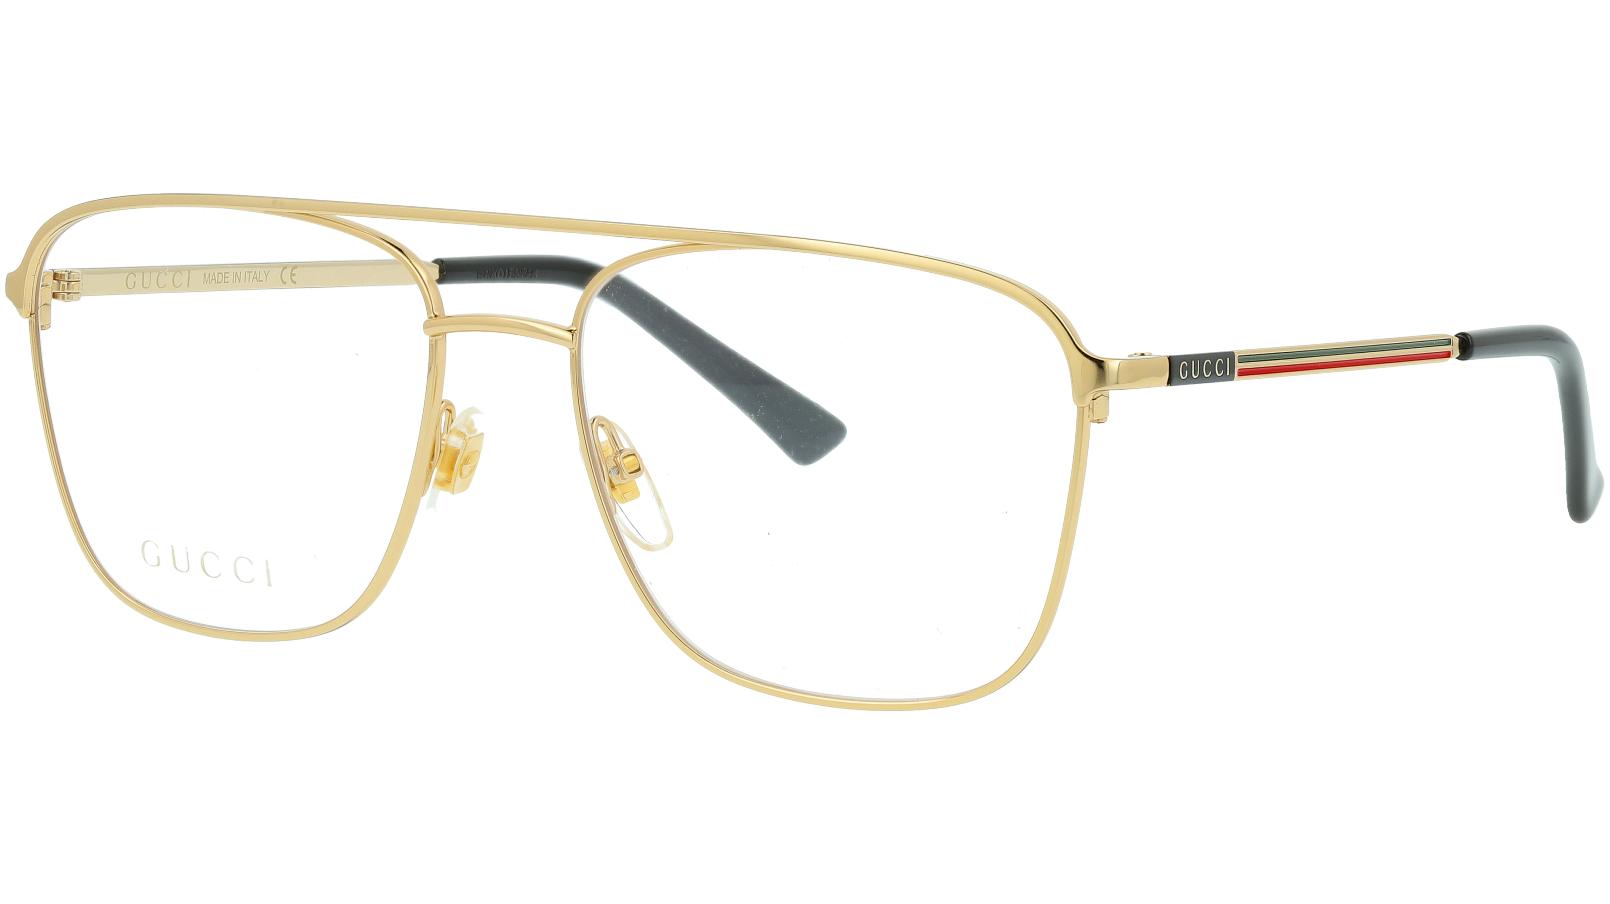 Gucci GG0833O 002 55 Gold Pilot Glasses